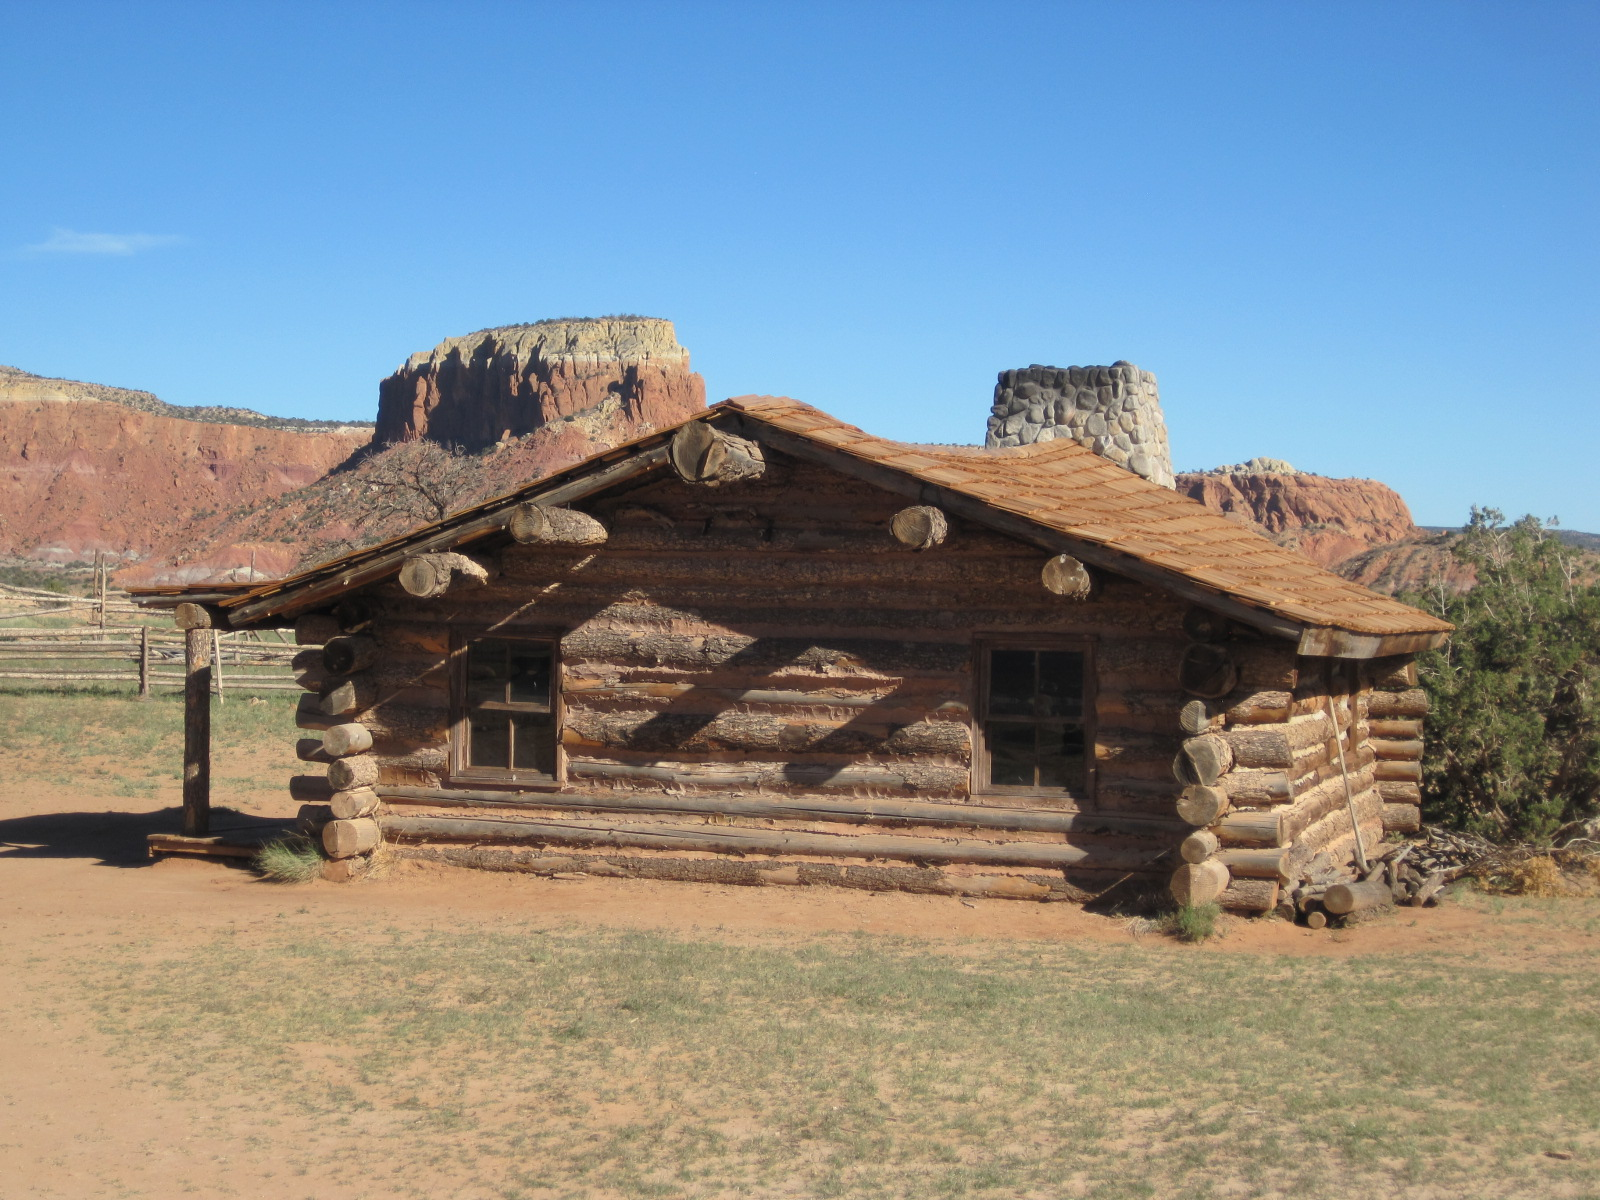 Hard scrabble log cabin life in the West   Carol Cassara 1600x1200